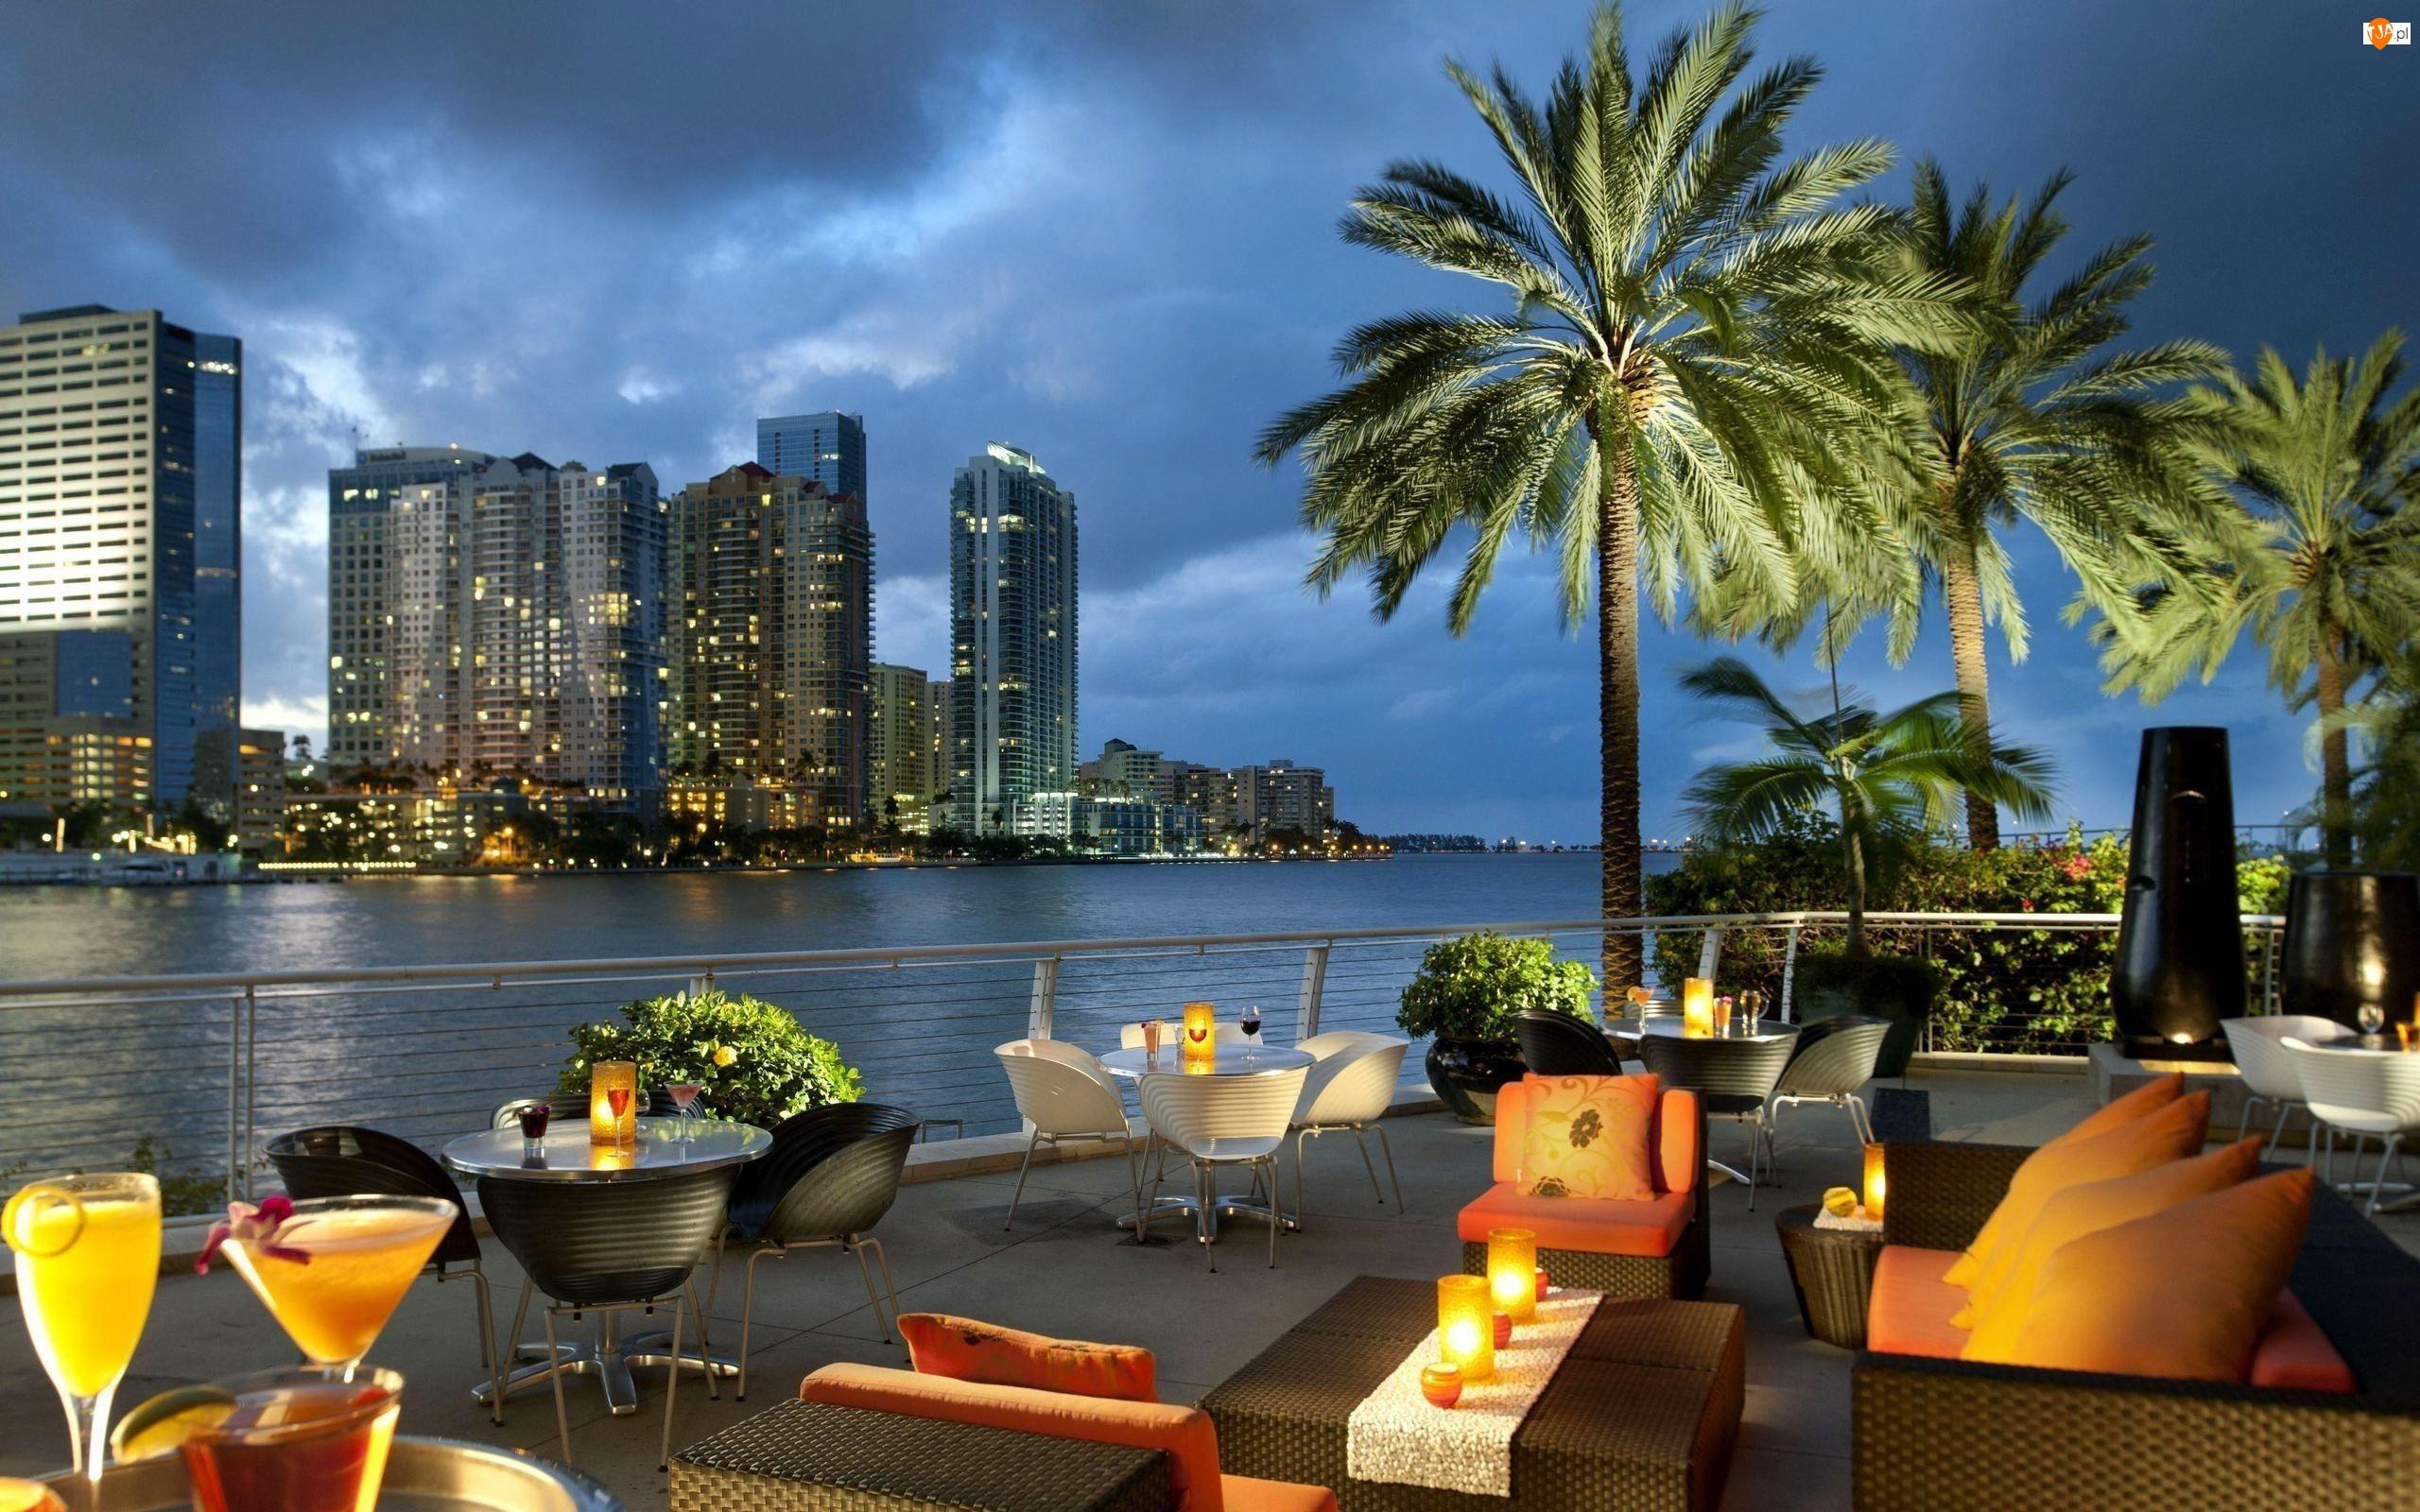 Restauracja, Floryda Drapacze chmur, Panorama, Miami